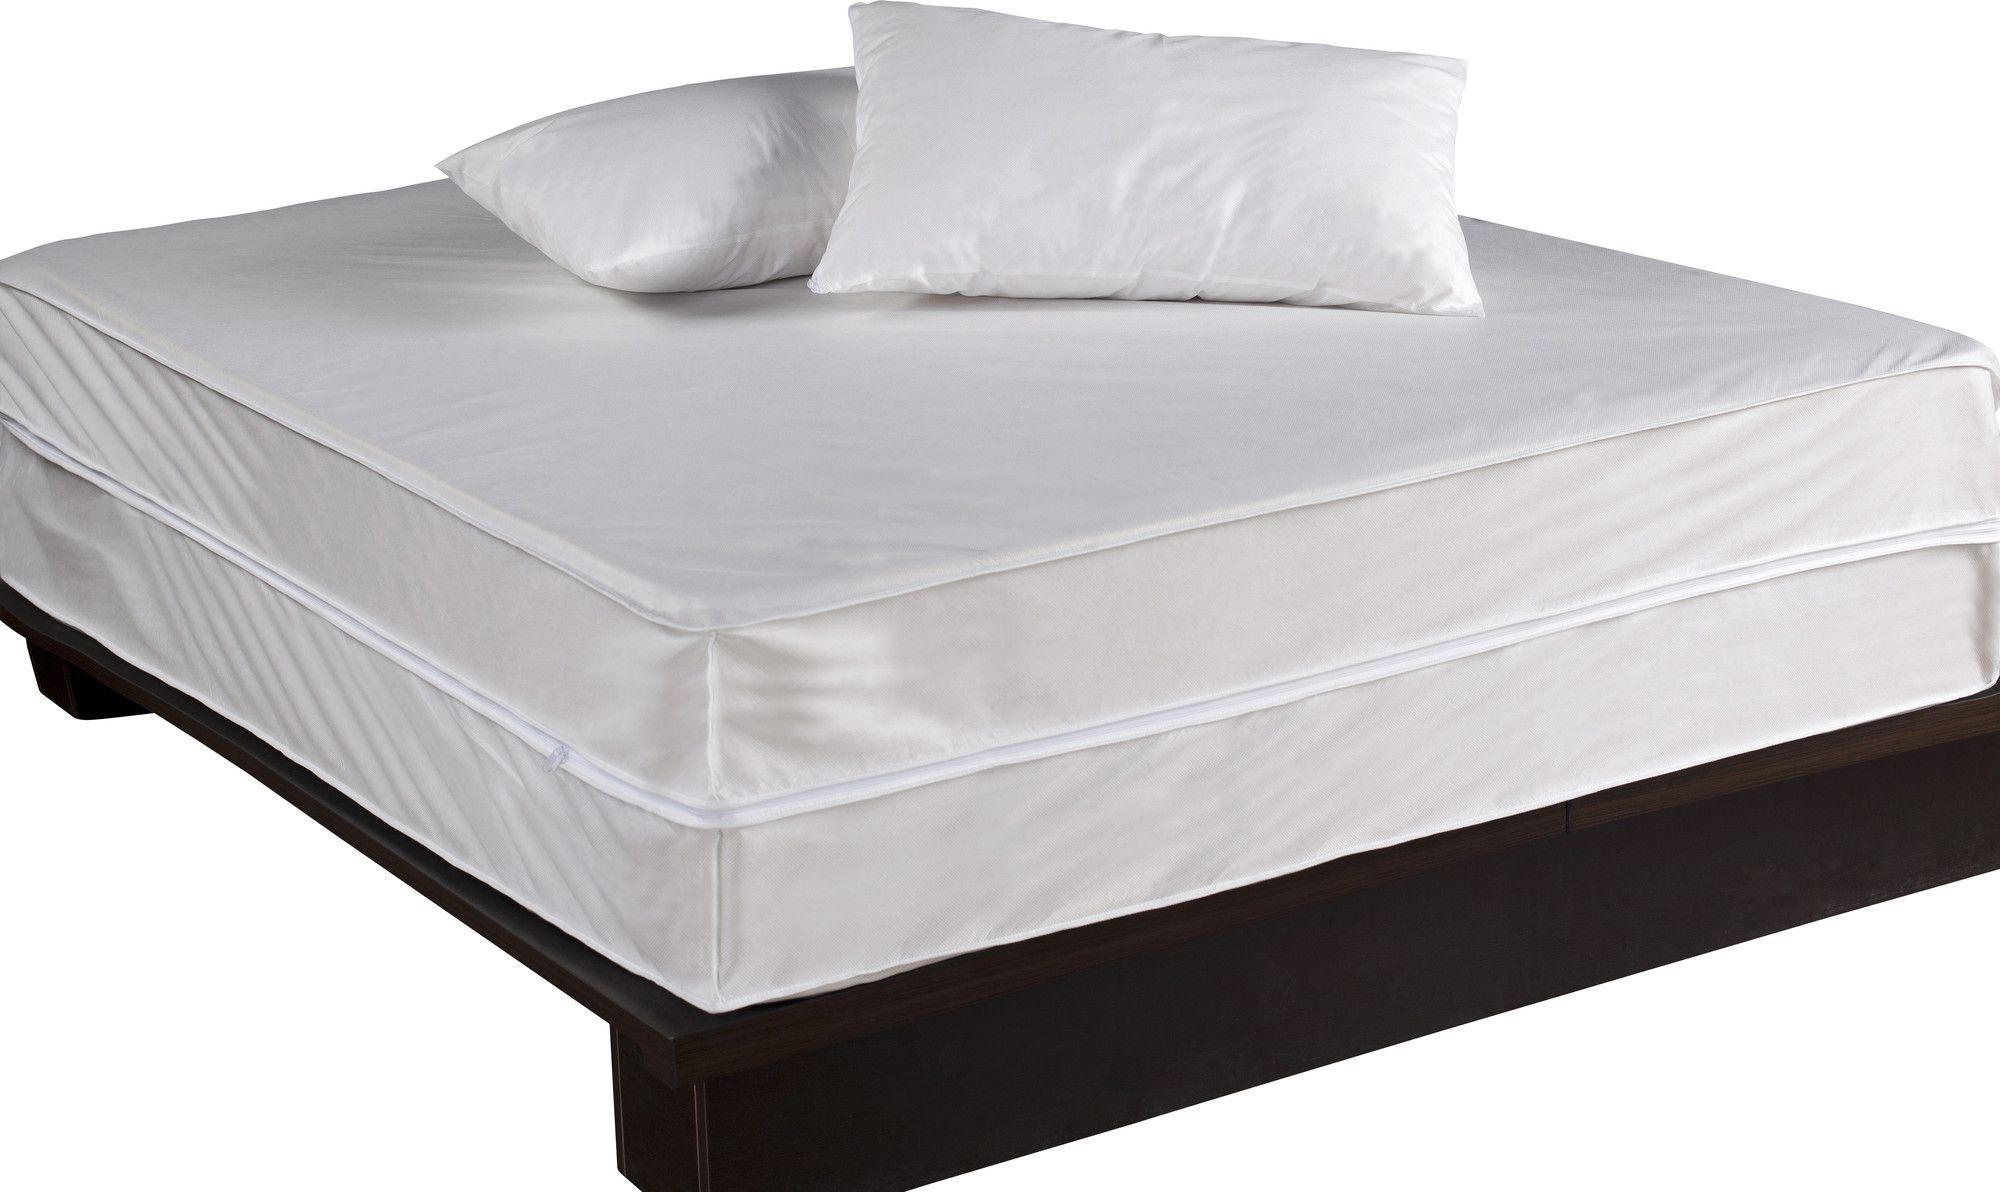 Bed Bug & Dust Mite Control Waterproof Polypropylene Basic